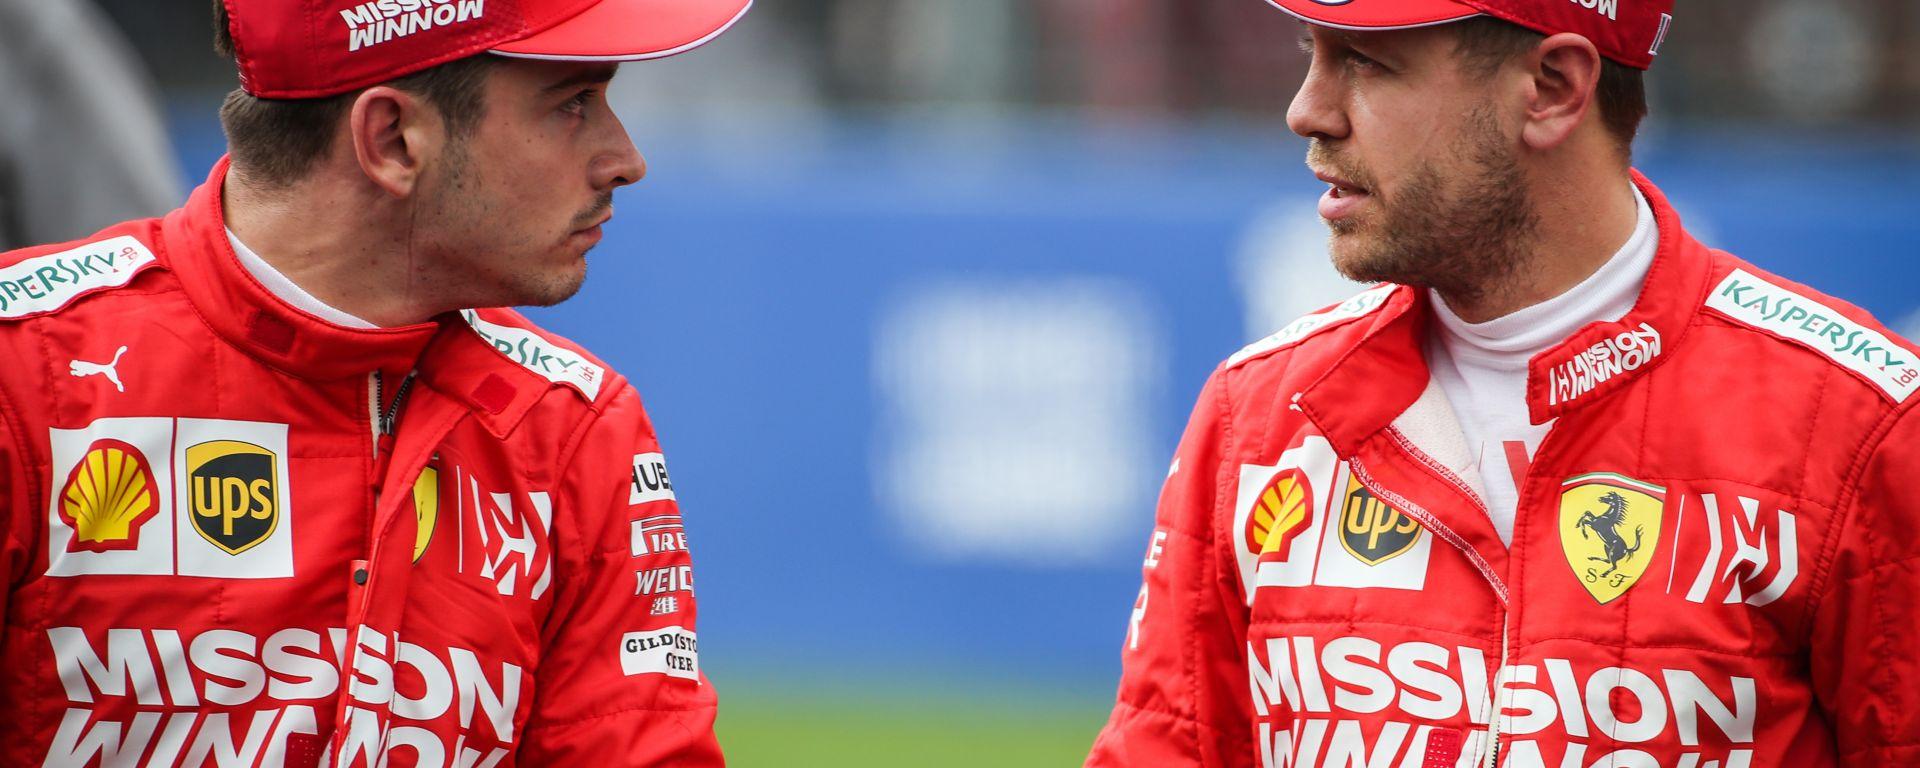 F1 GP Messico 2019, Città del Messico: Sebastian Vettel e Charles Leclerc (Ferrari)